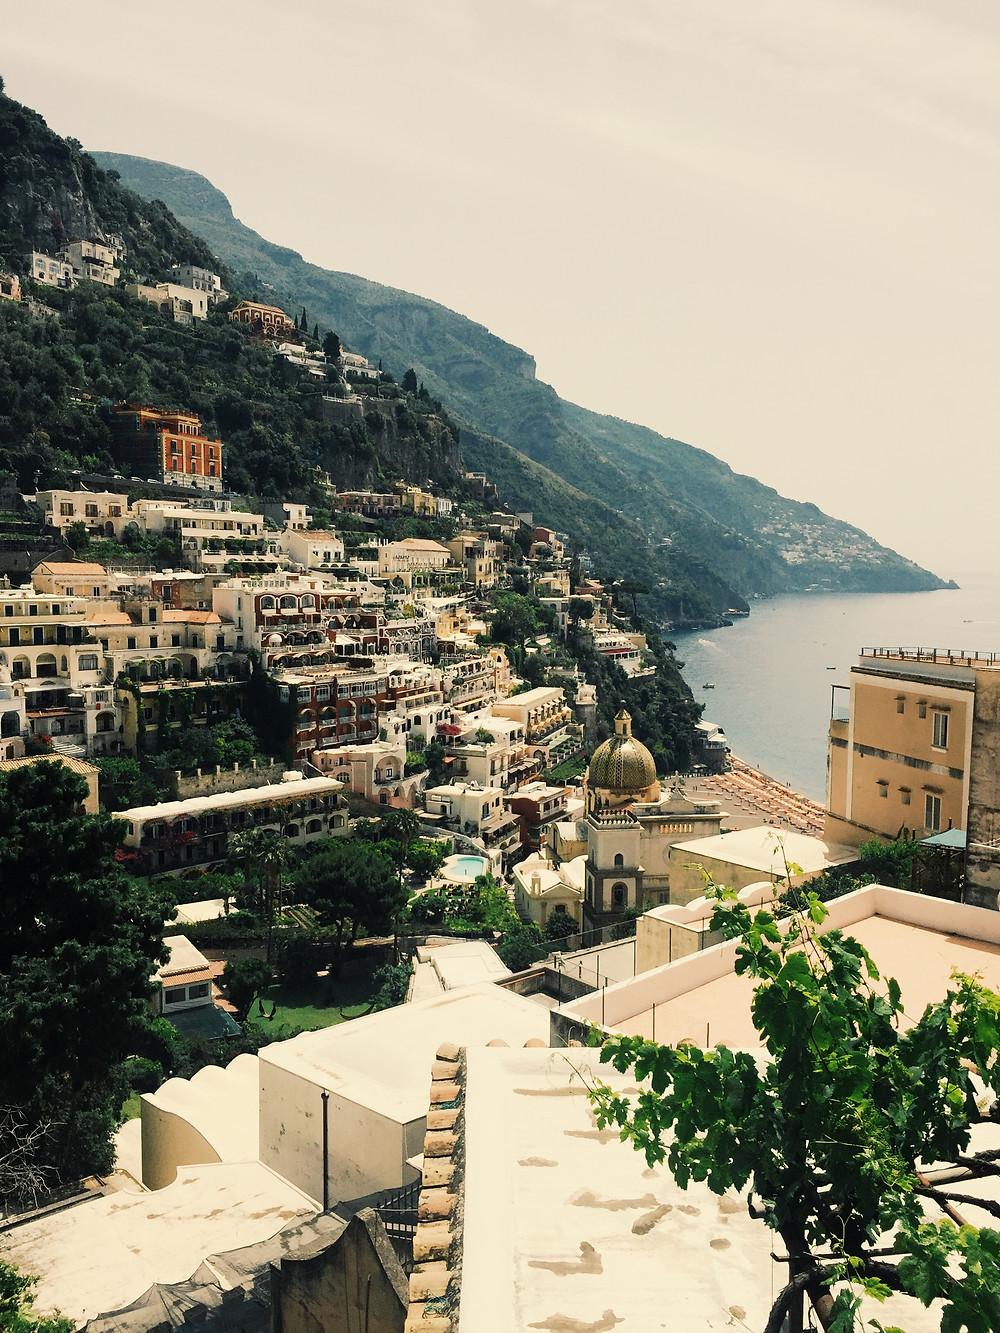 View from the Hotel Casa Albertina in Positano